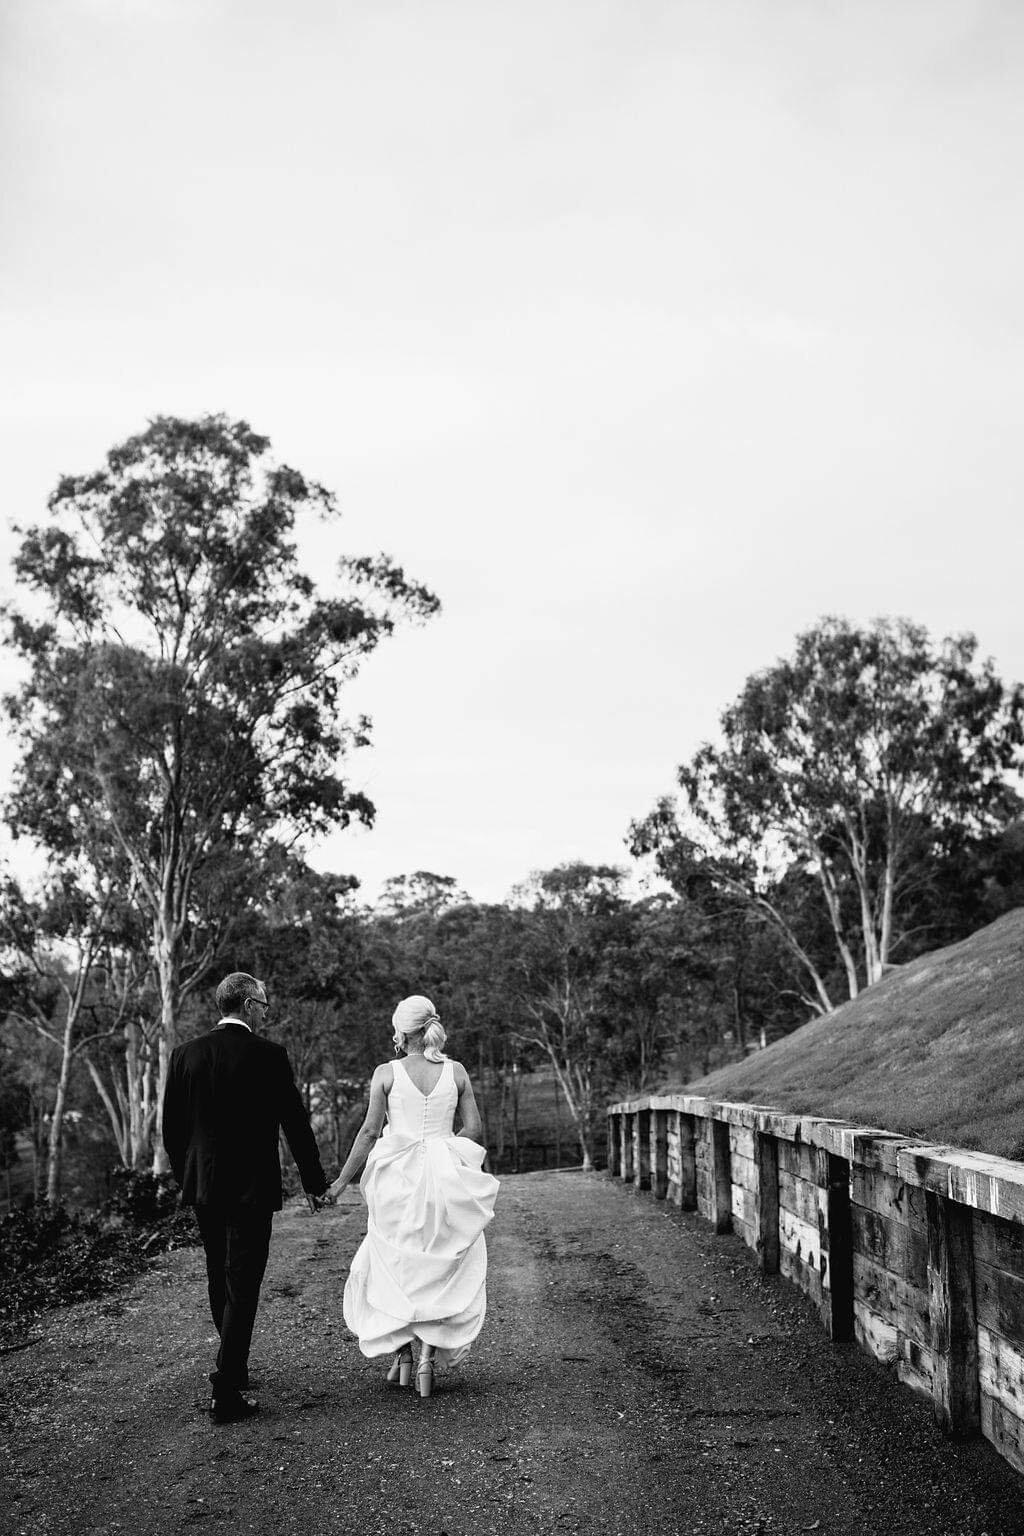 bespoke-bridal-shop-designer-helena-couture-designs-custom-wedding-dresses-gold-coast-brisbane-affordable-suzie13